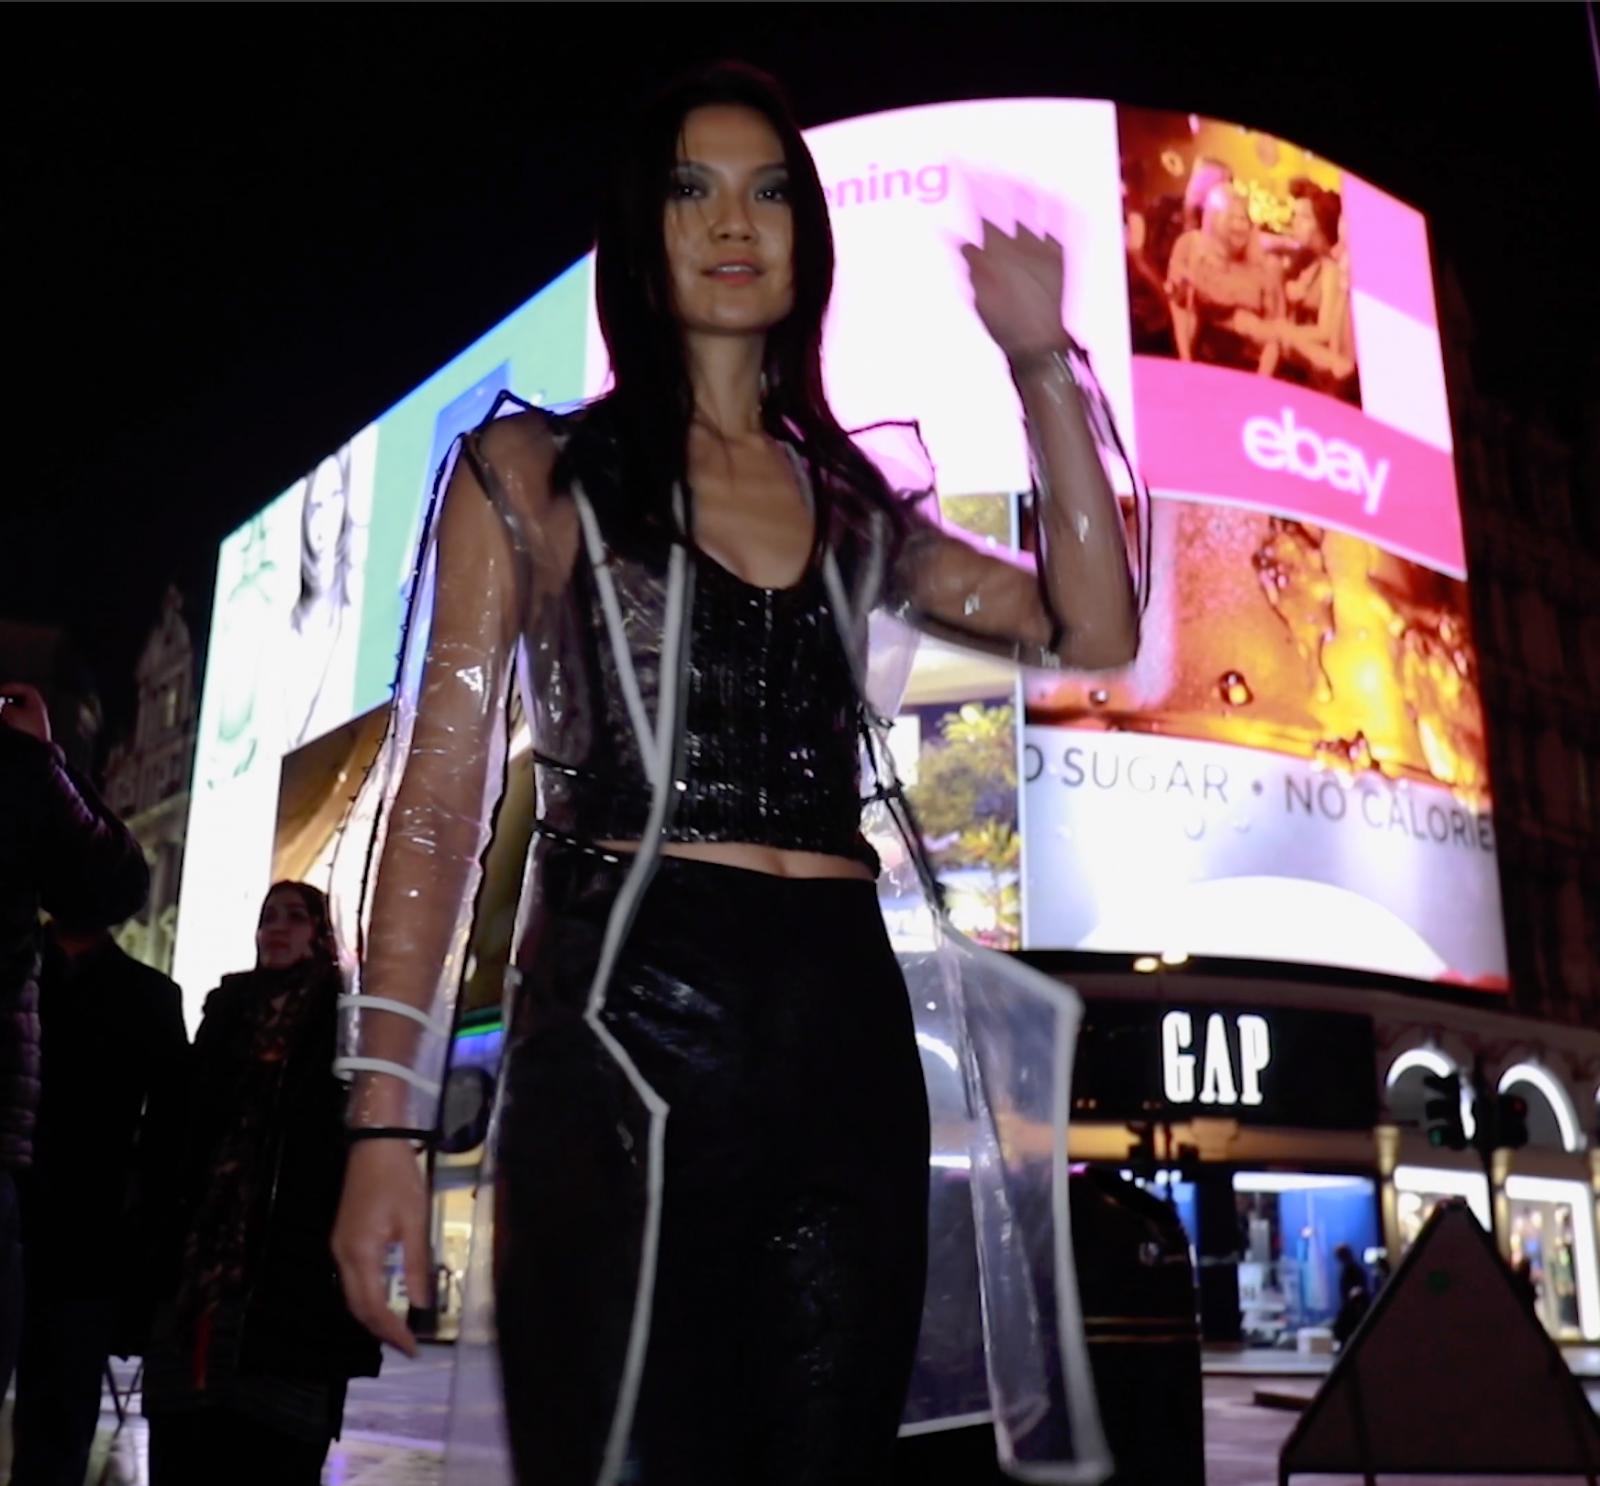 london shoot fashion beauty shoot video videografie fotografie - RSDesigns